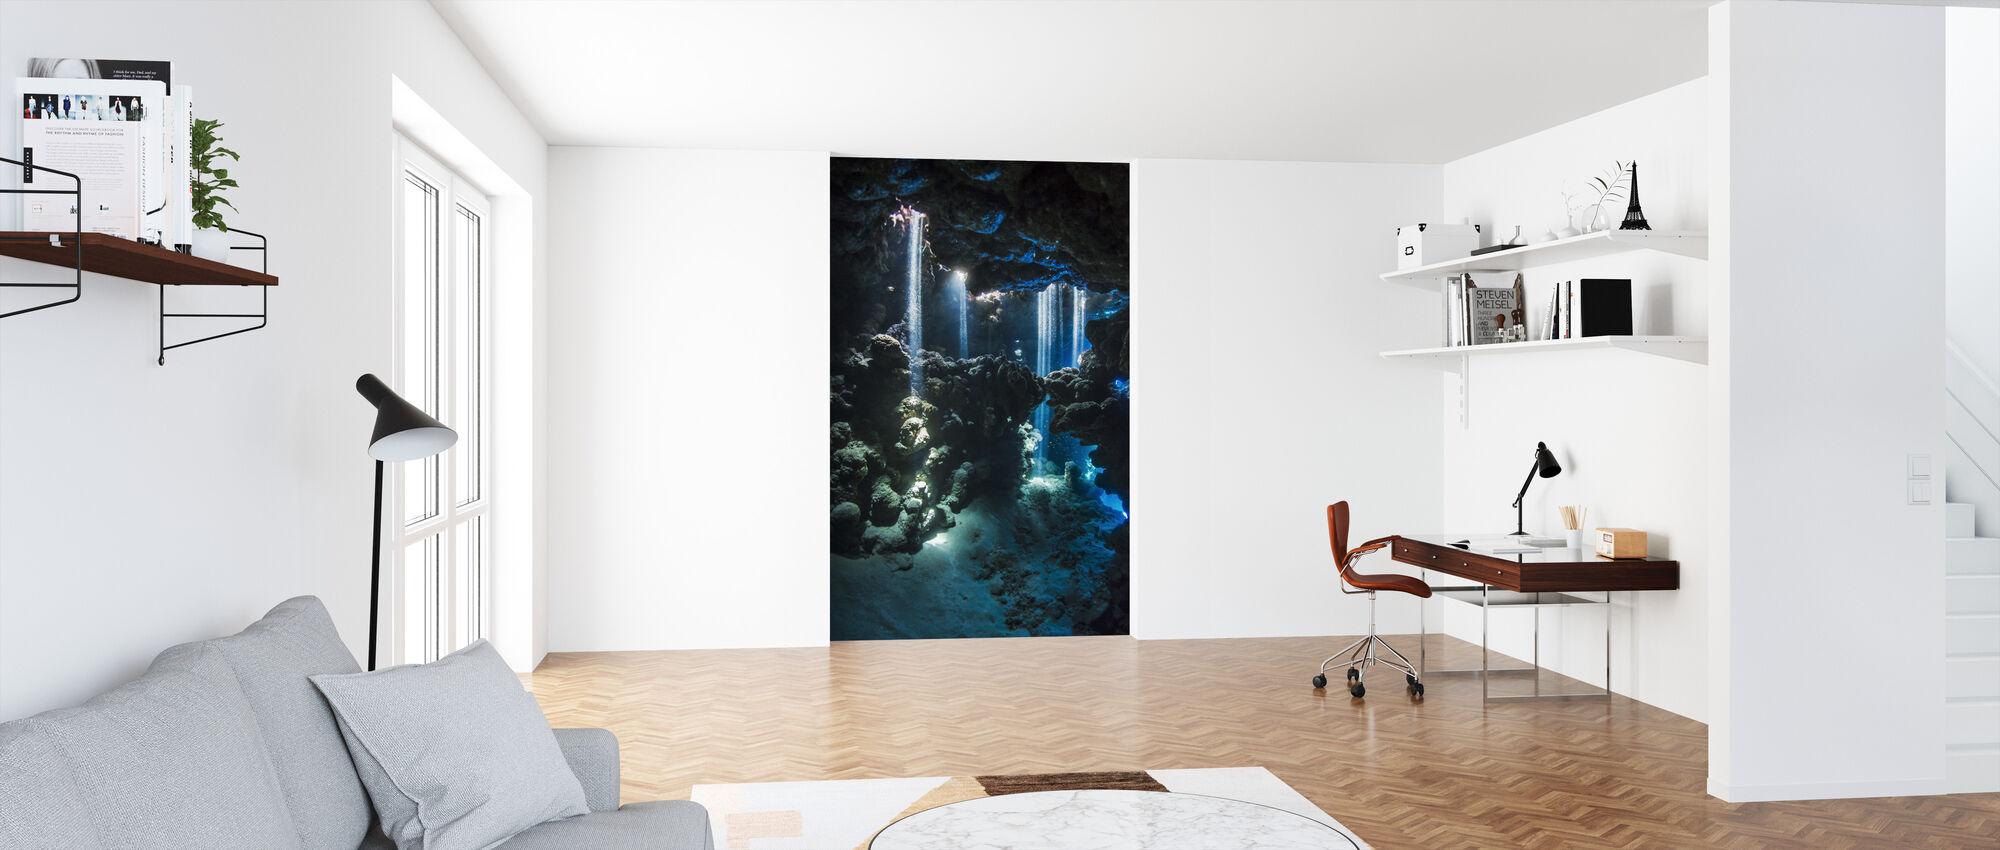 Shafts of Light - Wallpaper - Office